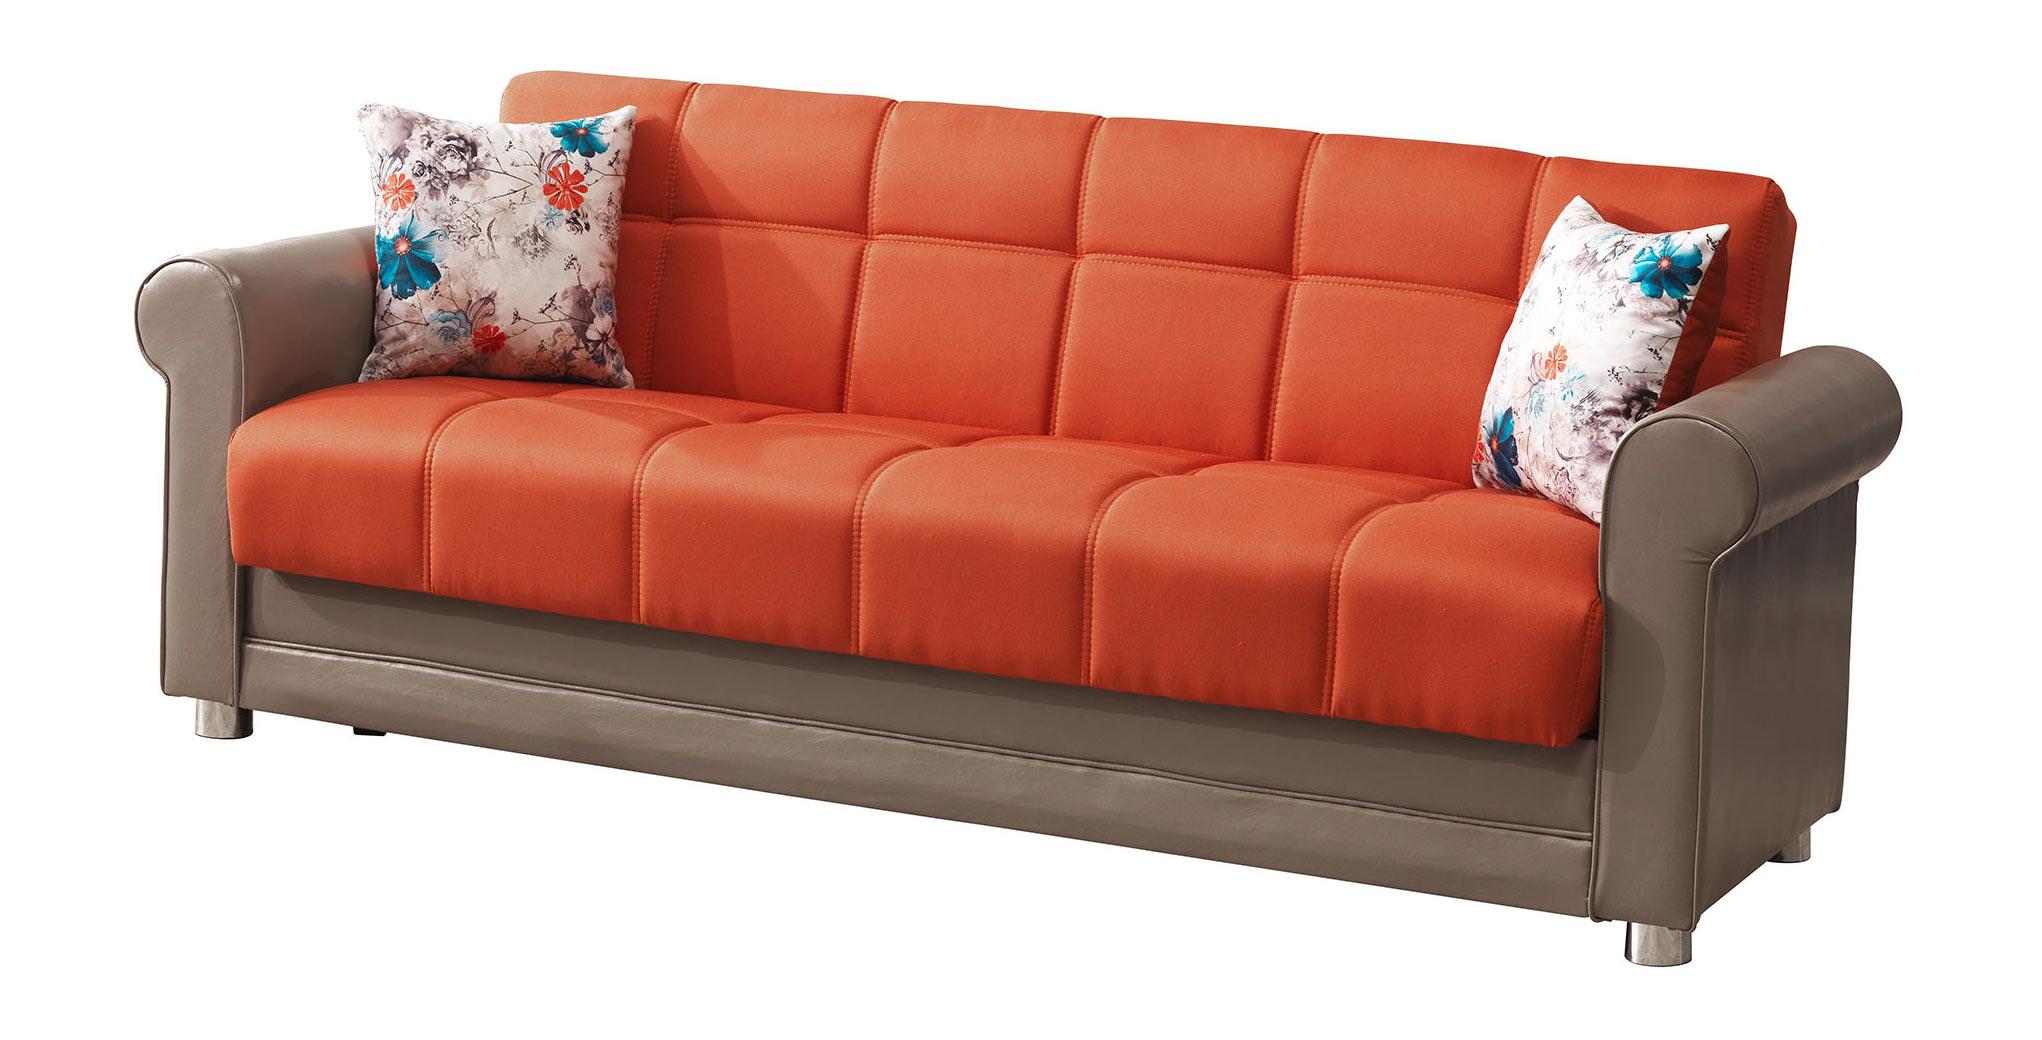 Avalon Prusa Orange Sofa by Casamode : AVALON PRUSA ORANGE SOFA SIT from futonland.com size 2042 x 1040 jpeg 189kB